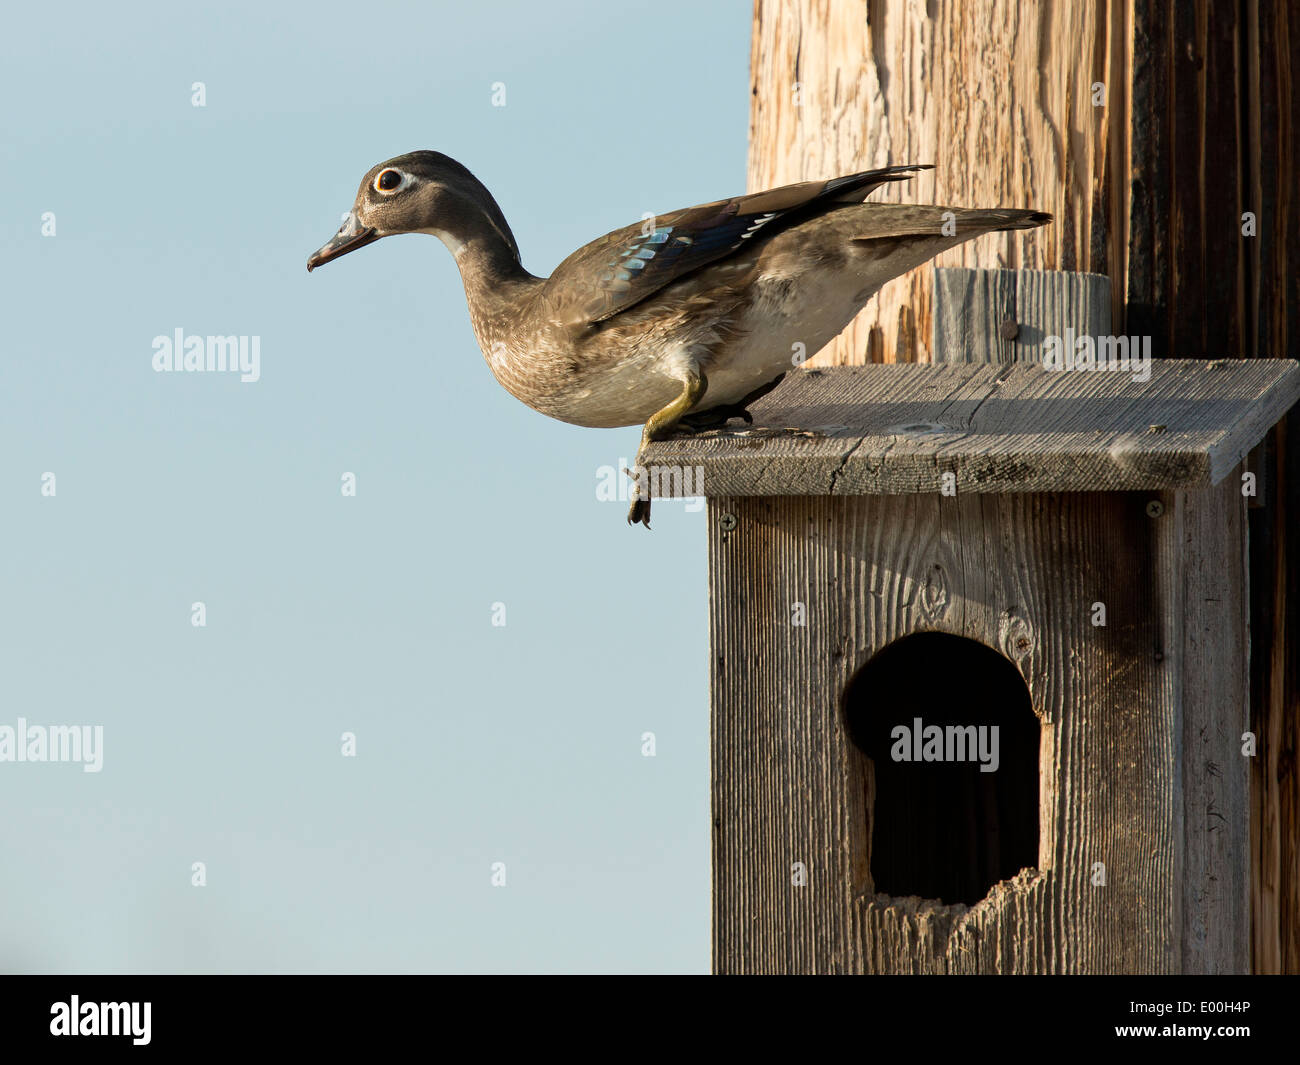 Wood duck nest box stock photos wood duck nest box stock images nesting wood duck stock image publicscrutiny Choice Image